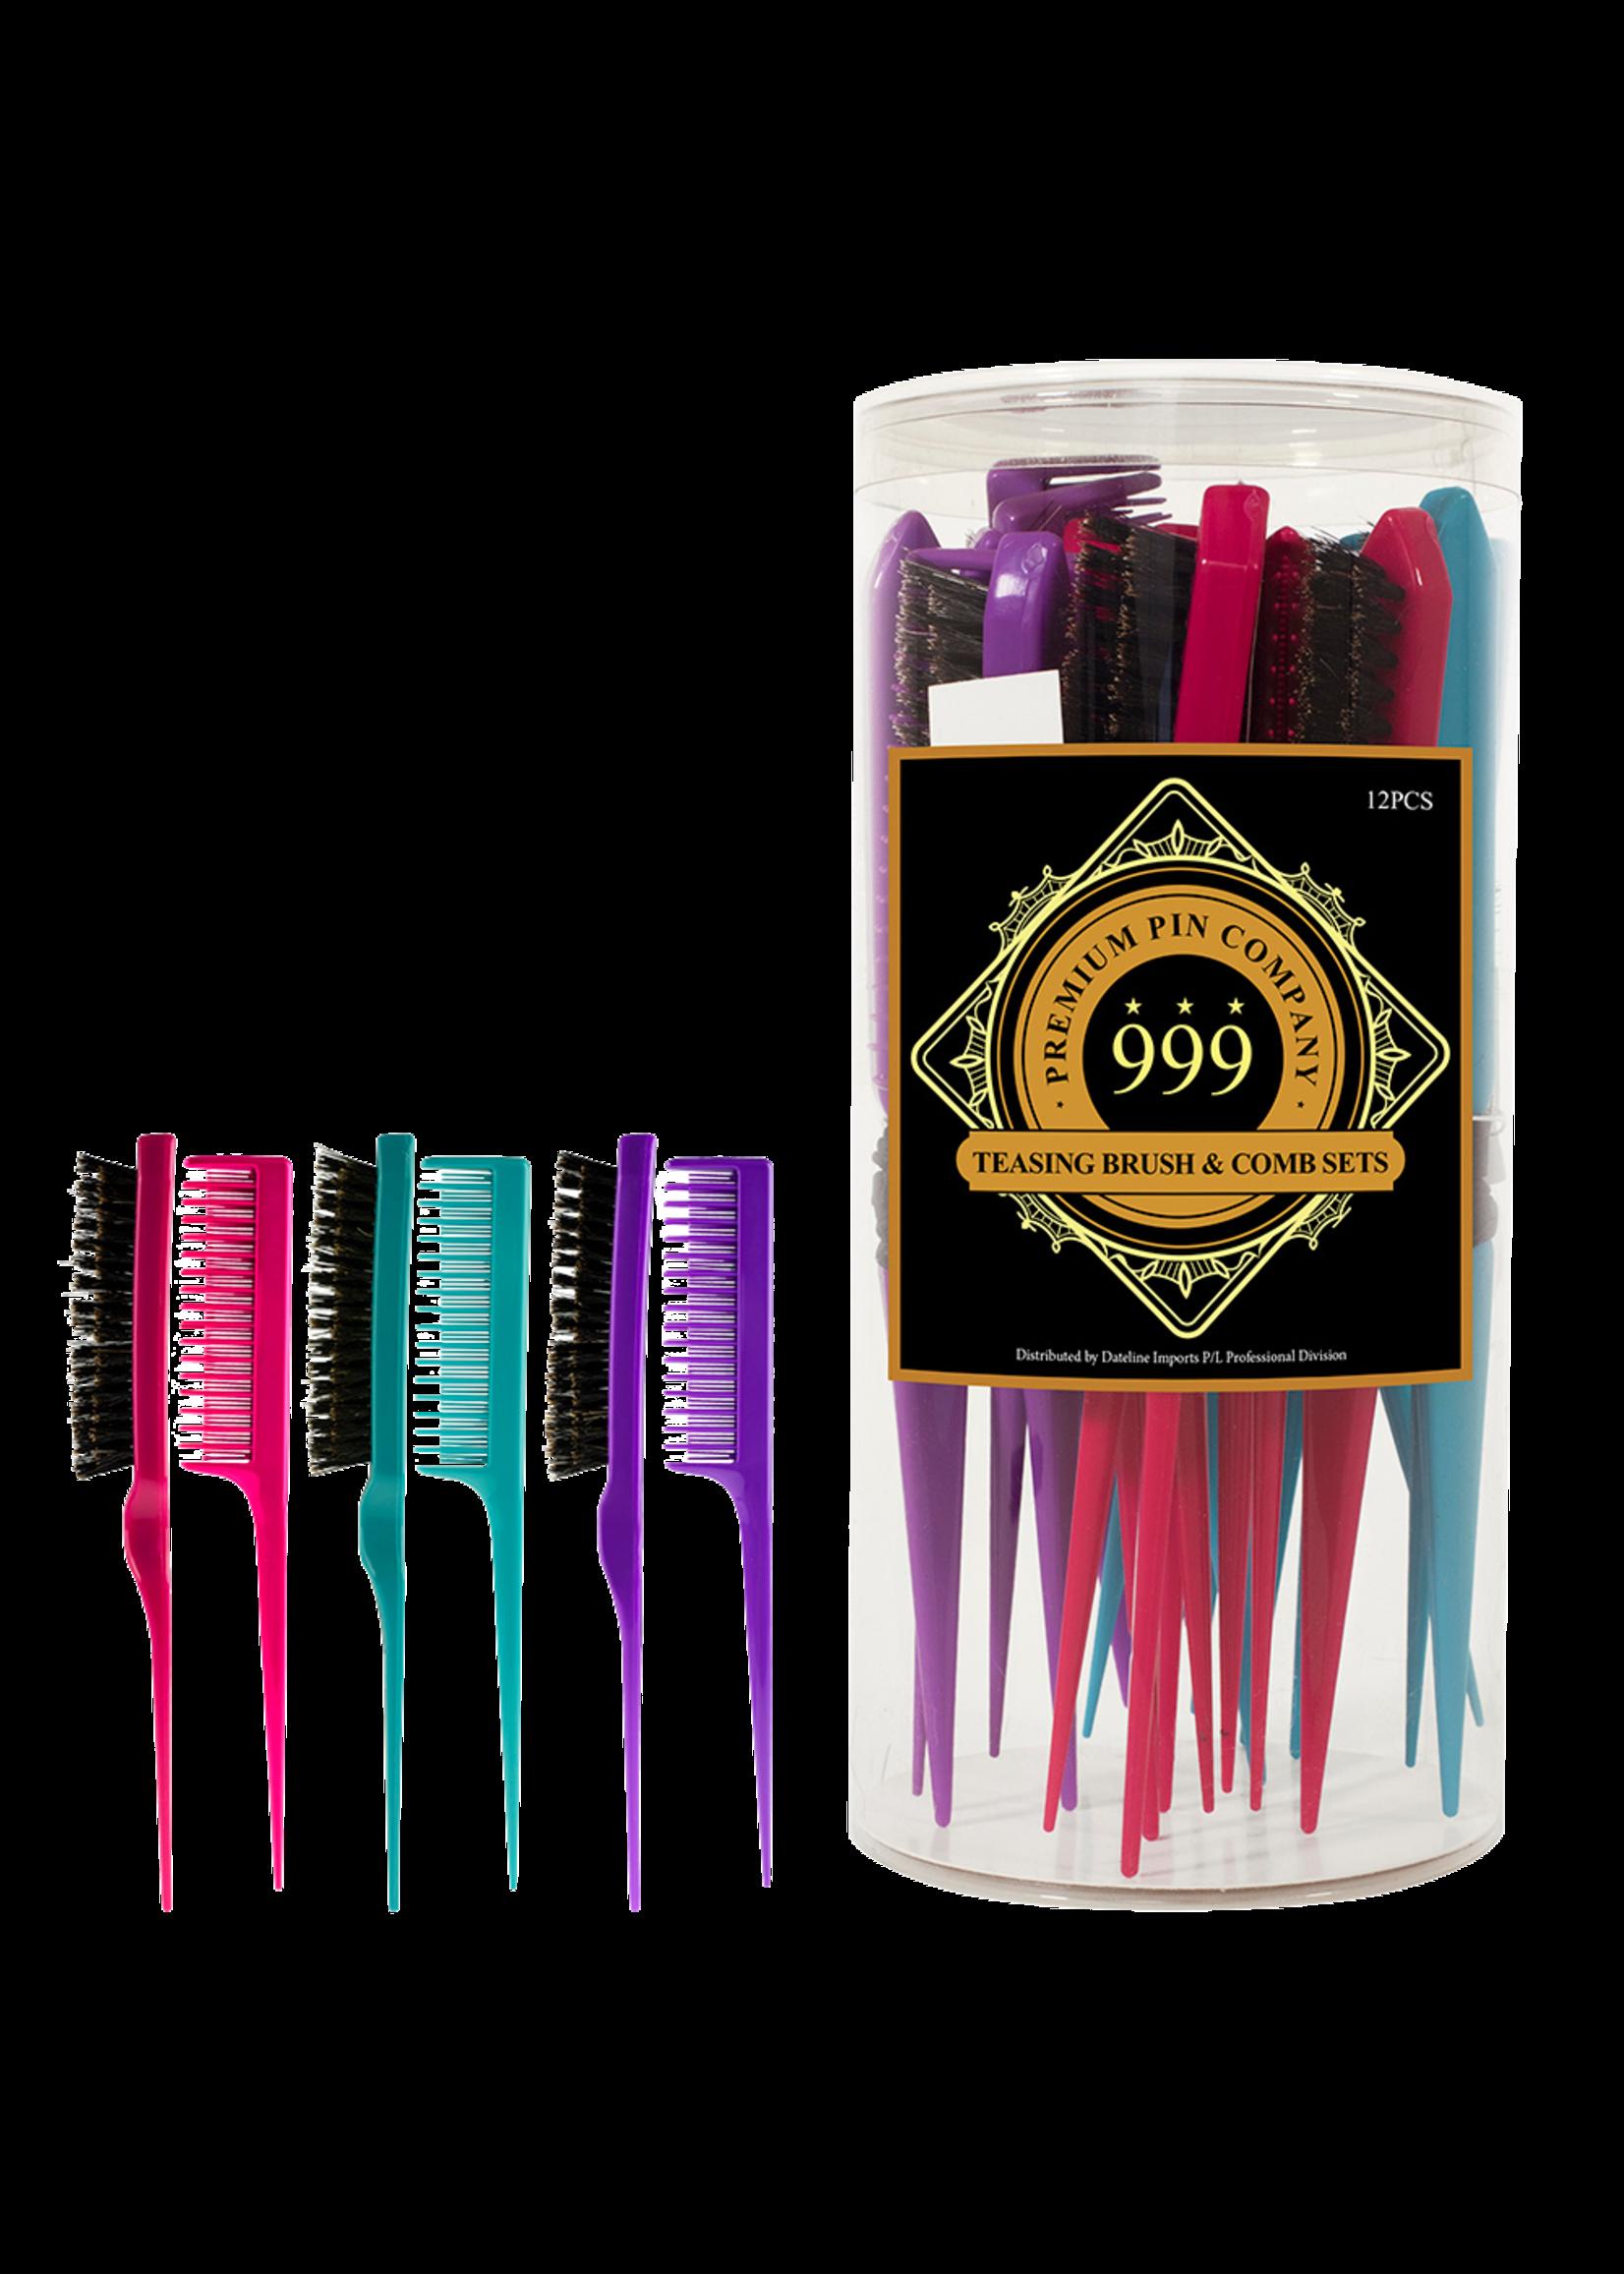 999 Premium Pin Company 999 Teasing Brush & Comb Duos Coloured Tub 12pcs